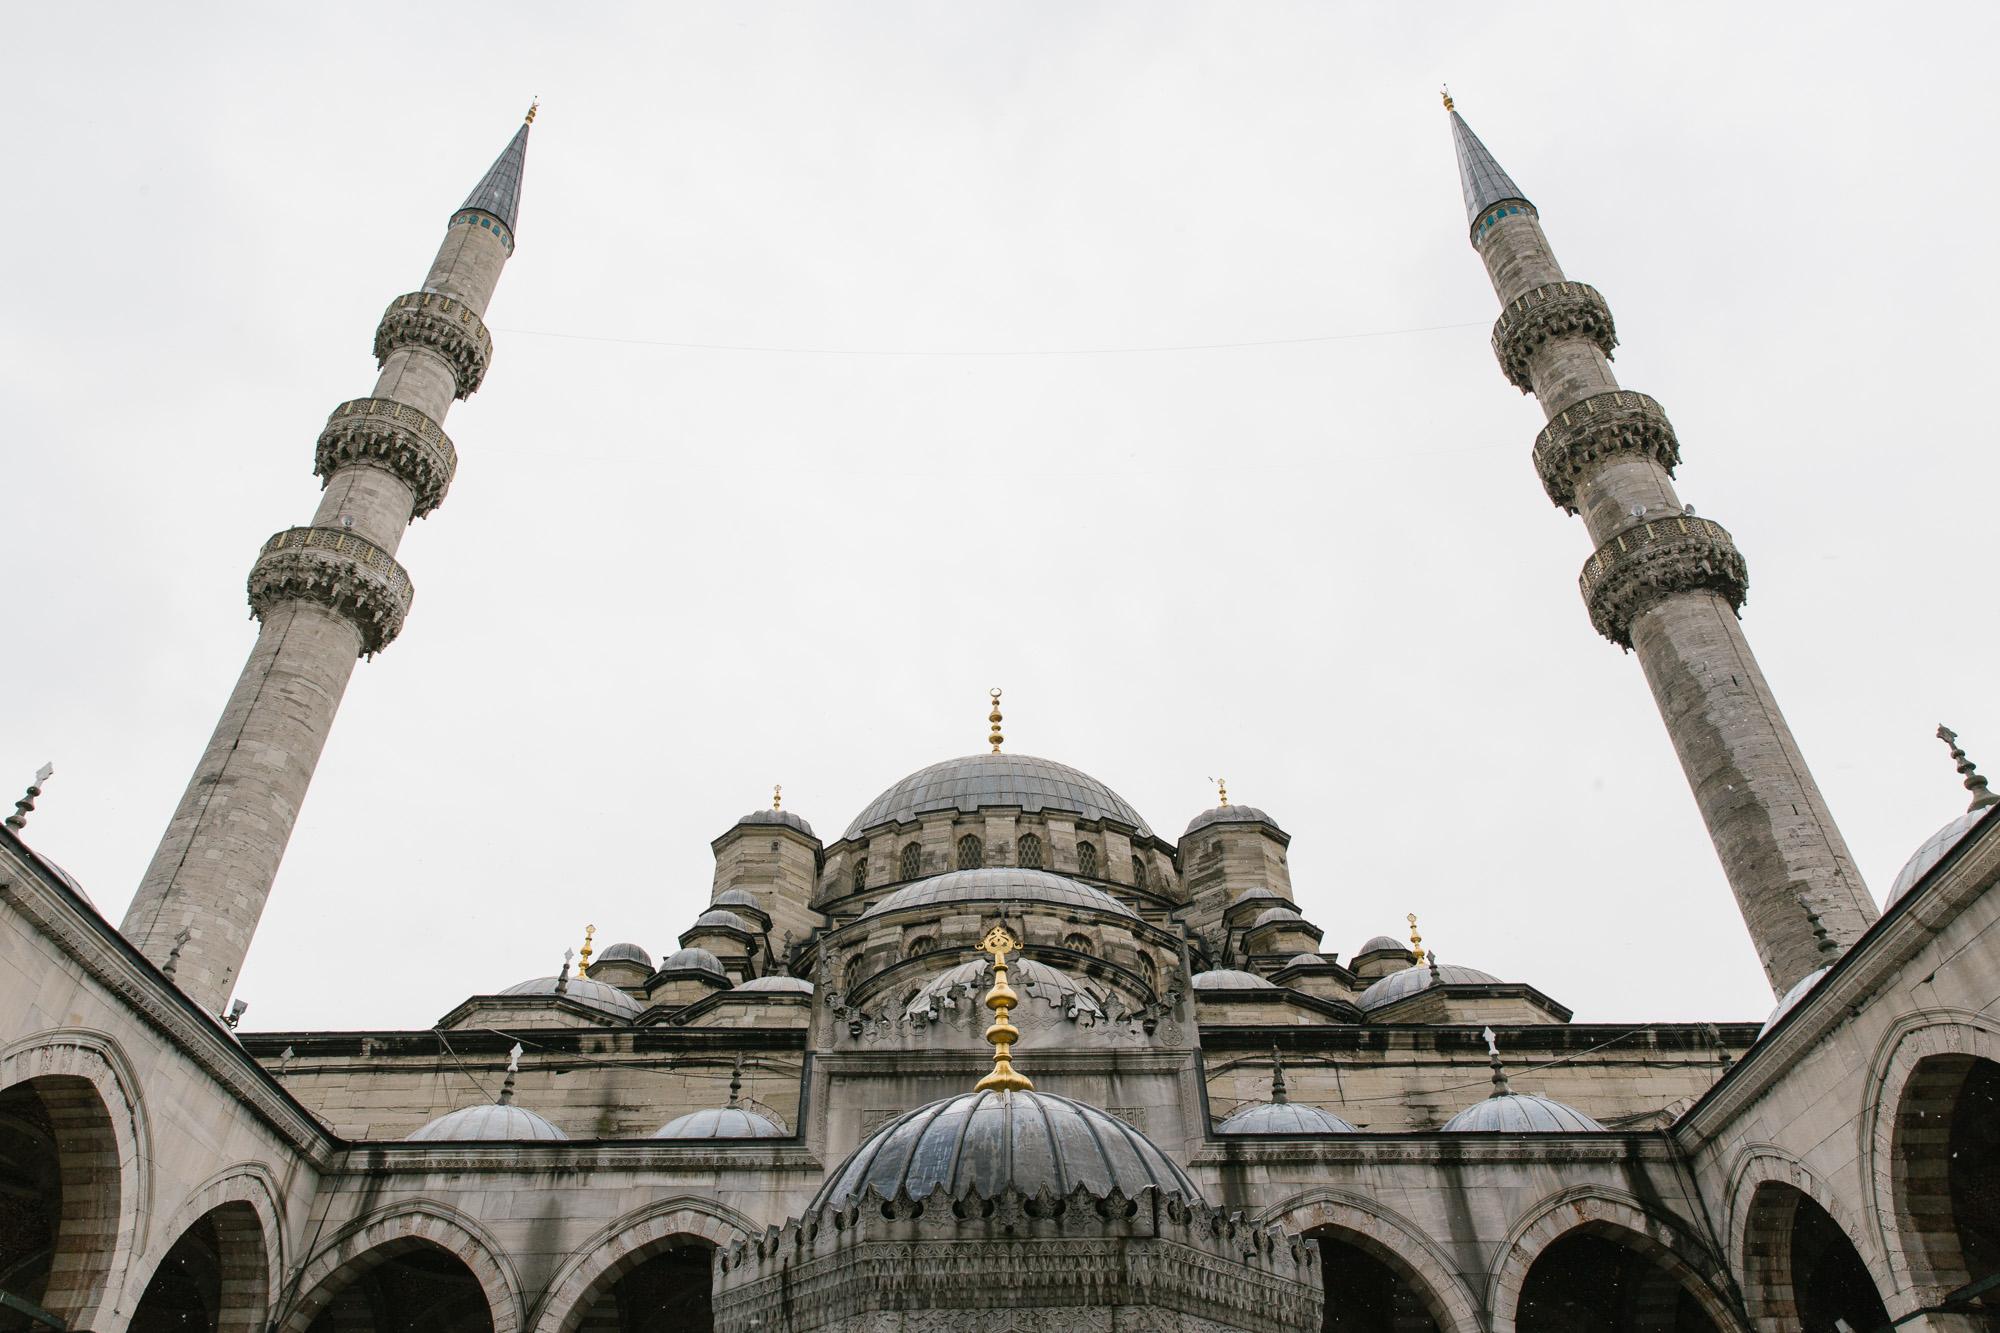 Istanbul-AudiMagazine-FinnBeales-01.jpg